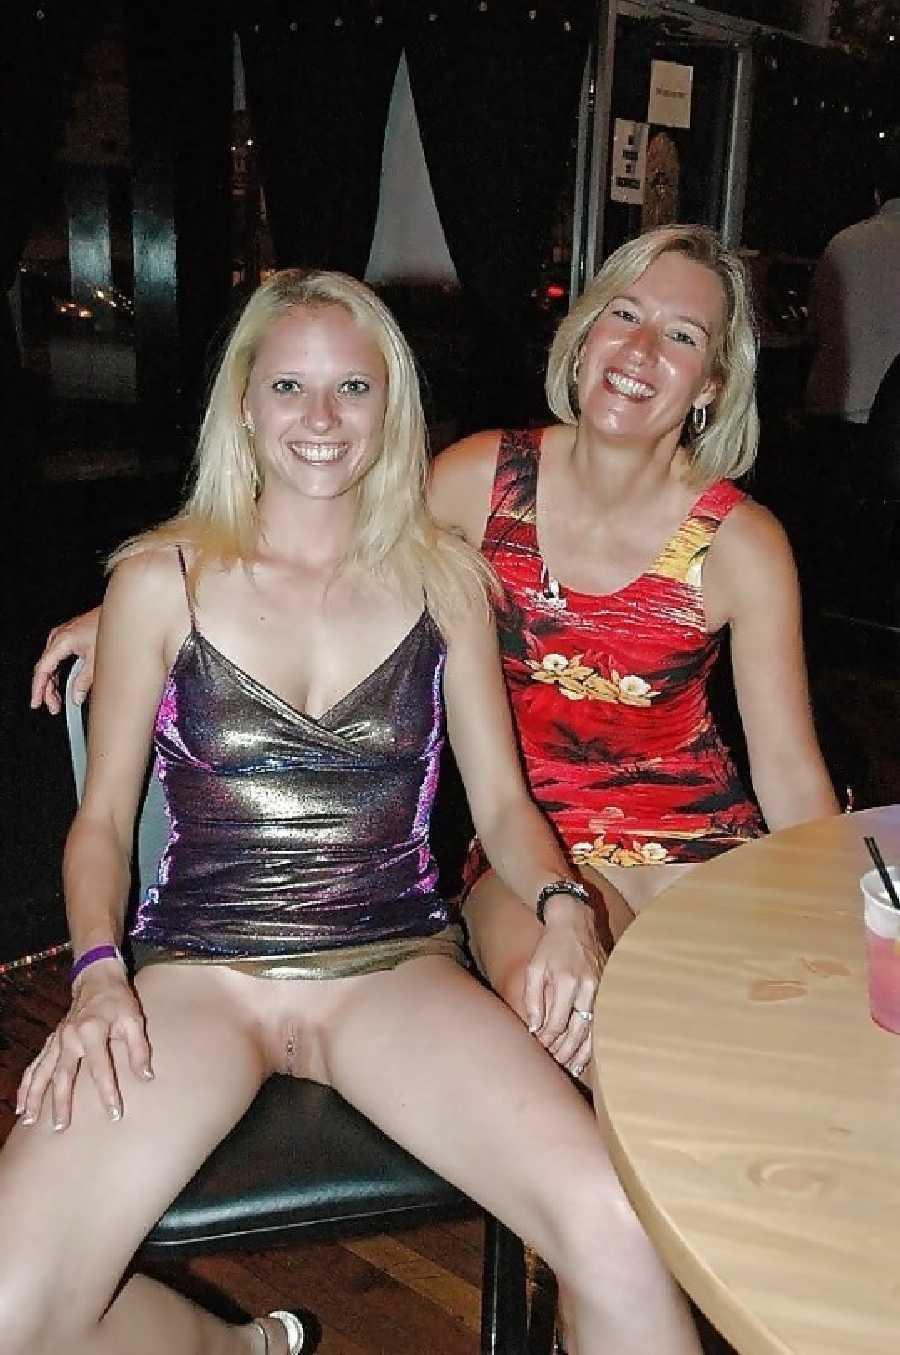 Shore jersey erotica